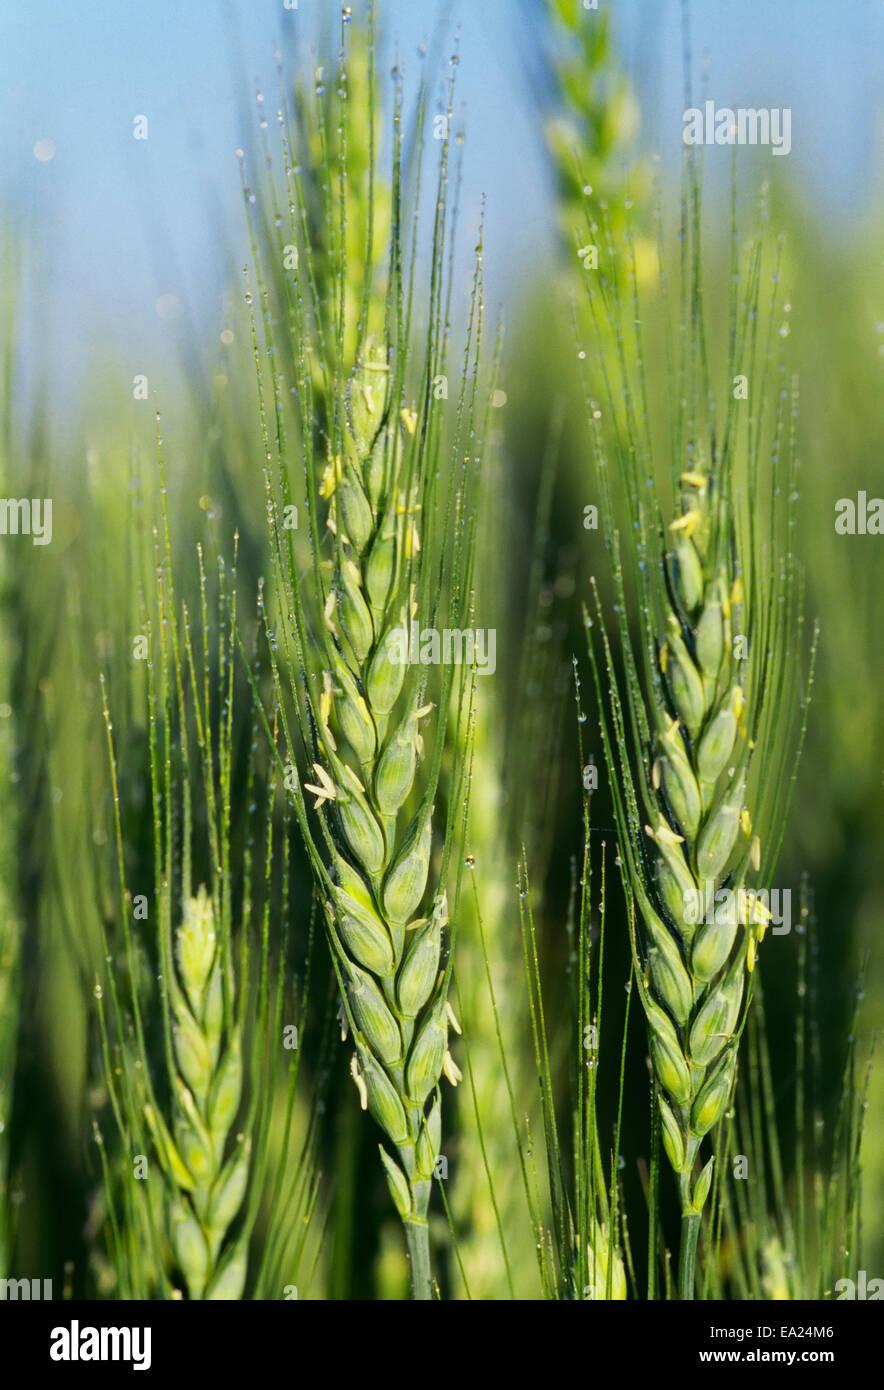 wheat stooling